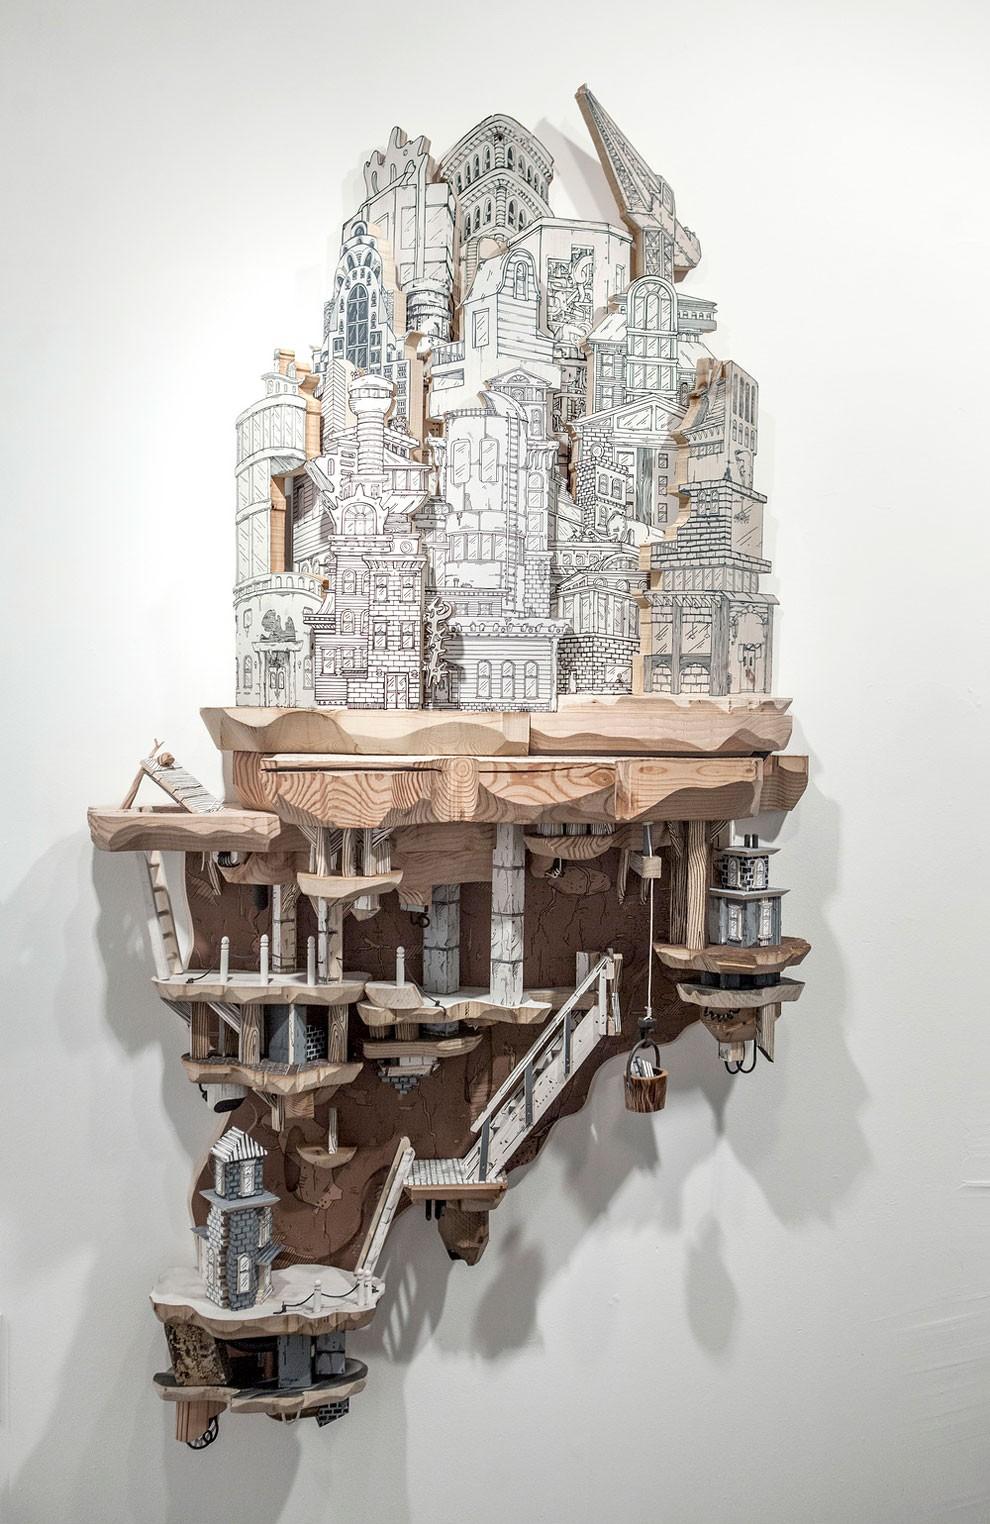 illustrazioni-scultura-mondi-miniatura-architettura-luke-o-sullivan-13